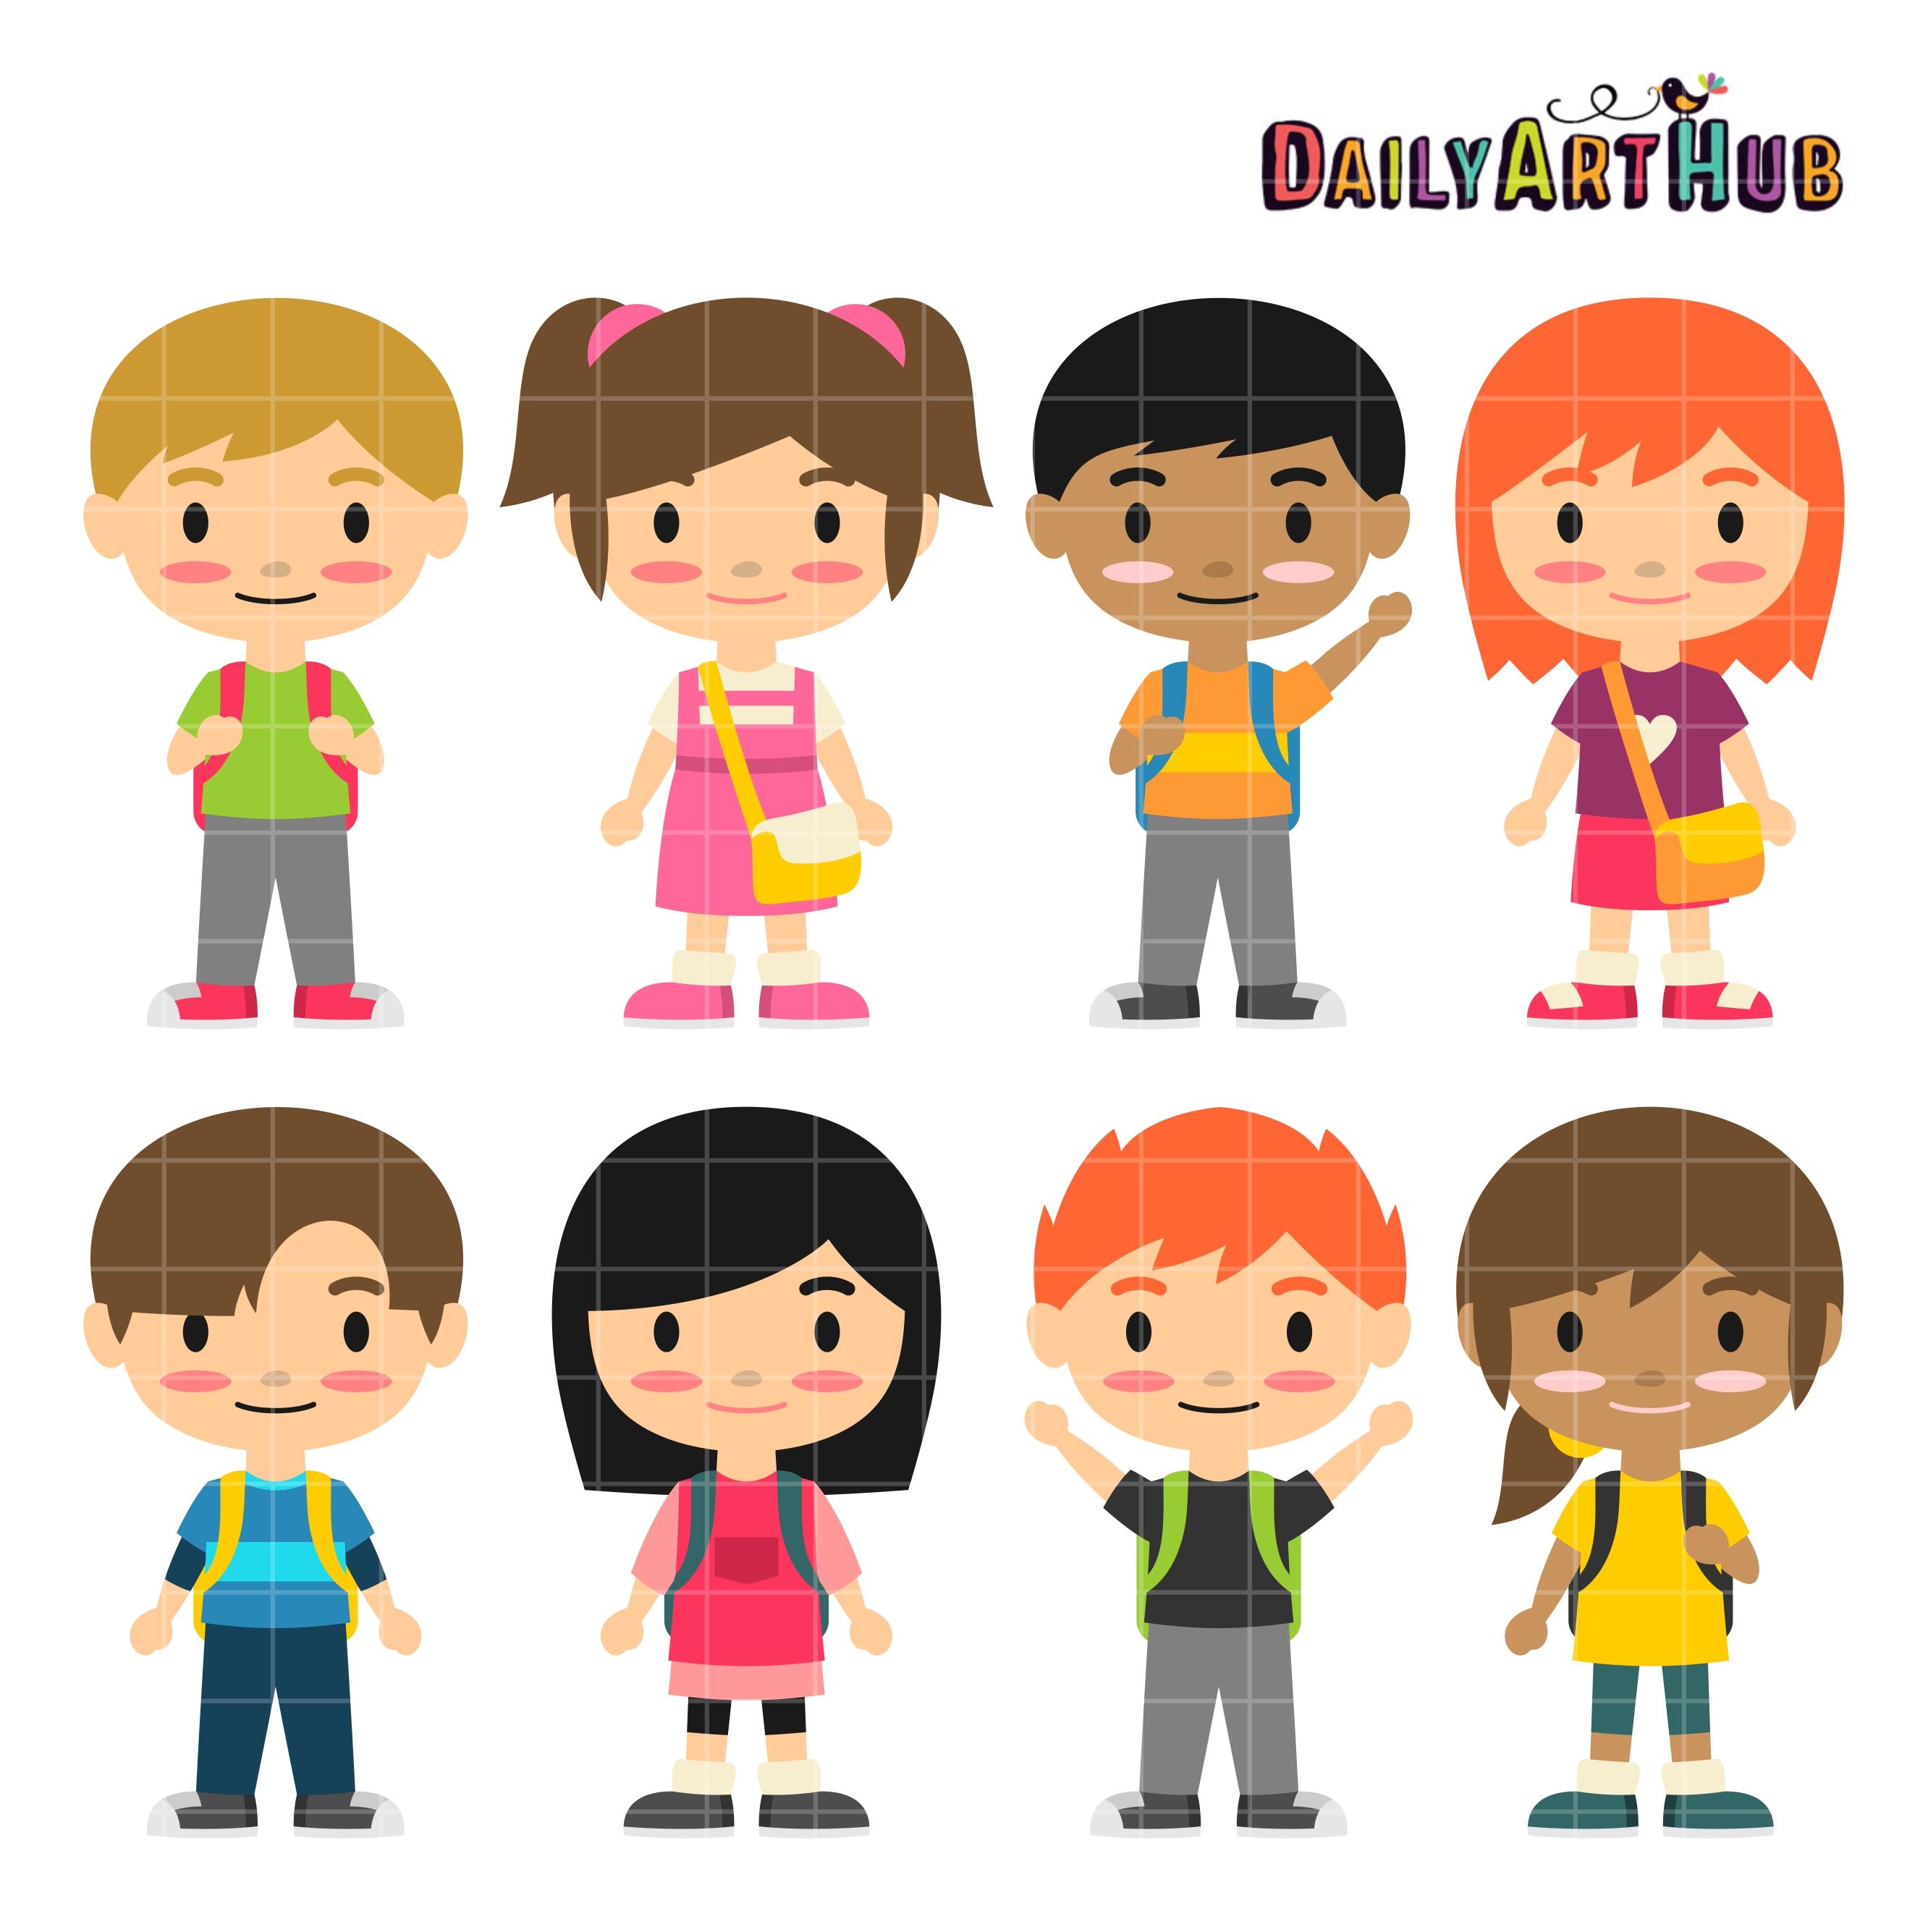 cute school kids clip art set daily art hub free clip art everyday rh dailyarthub com Cute Food Clip Art Cute Black and White Clip Art